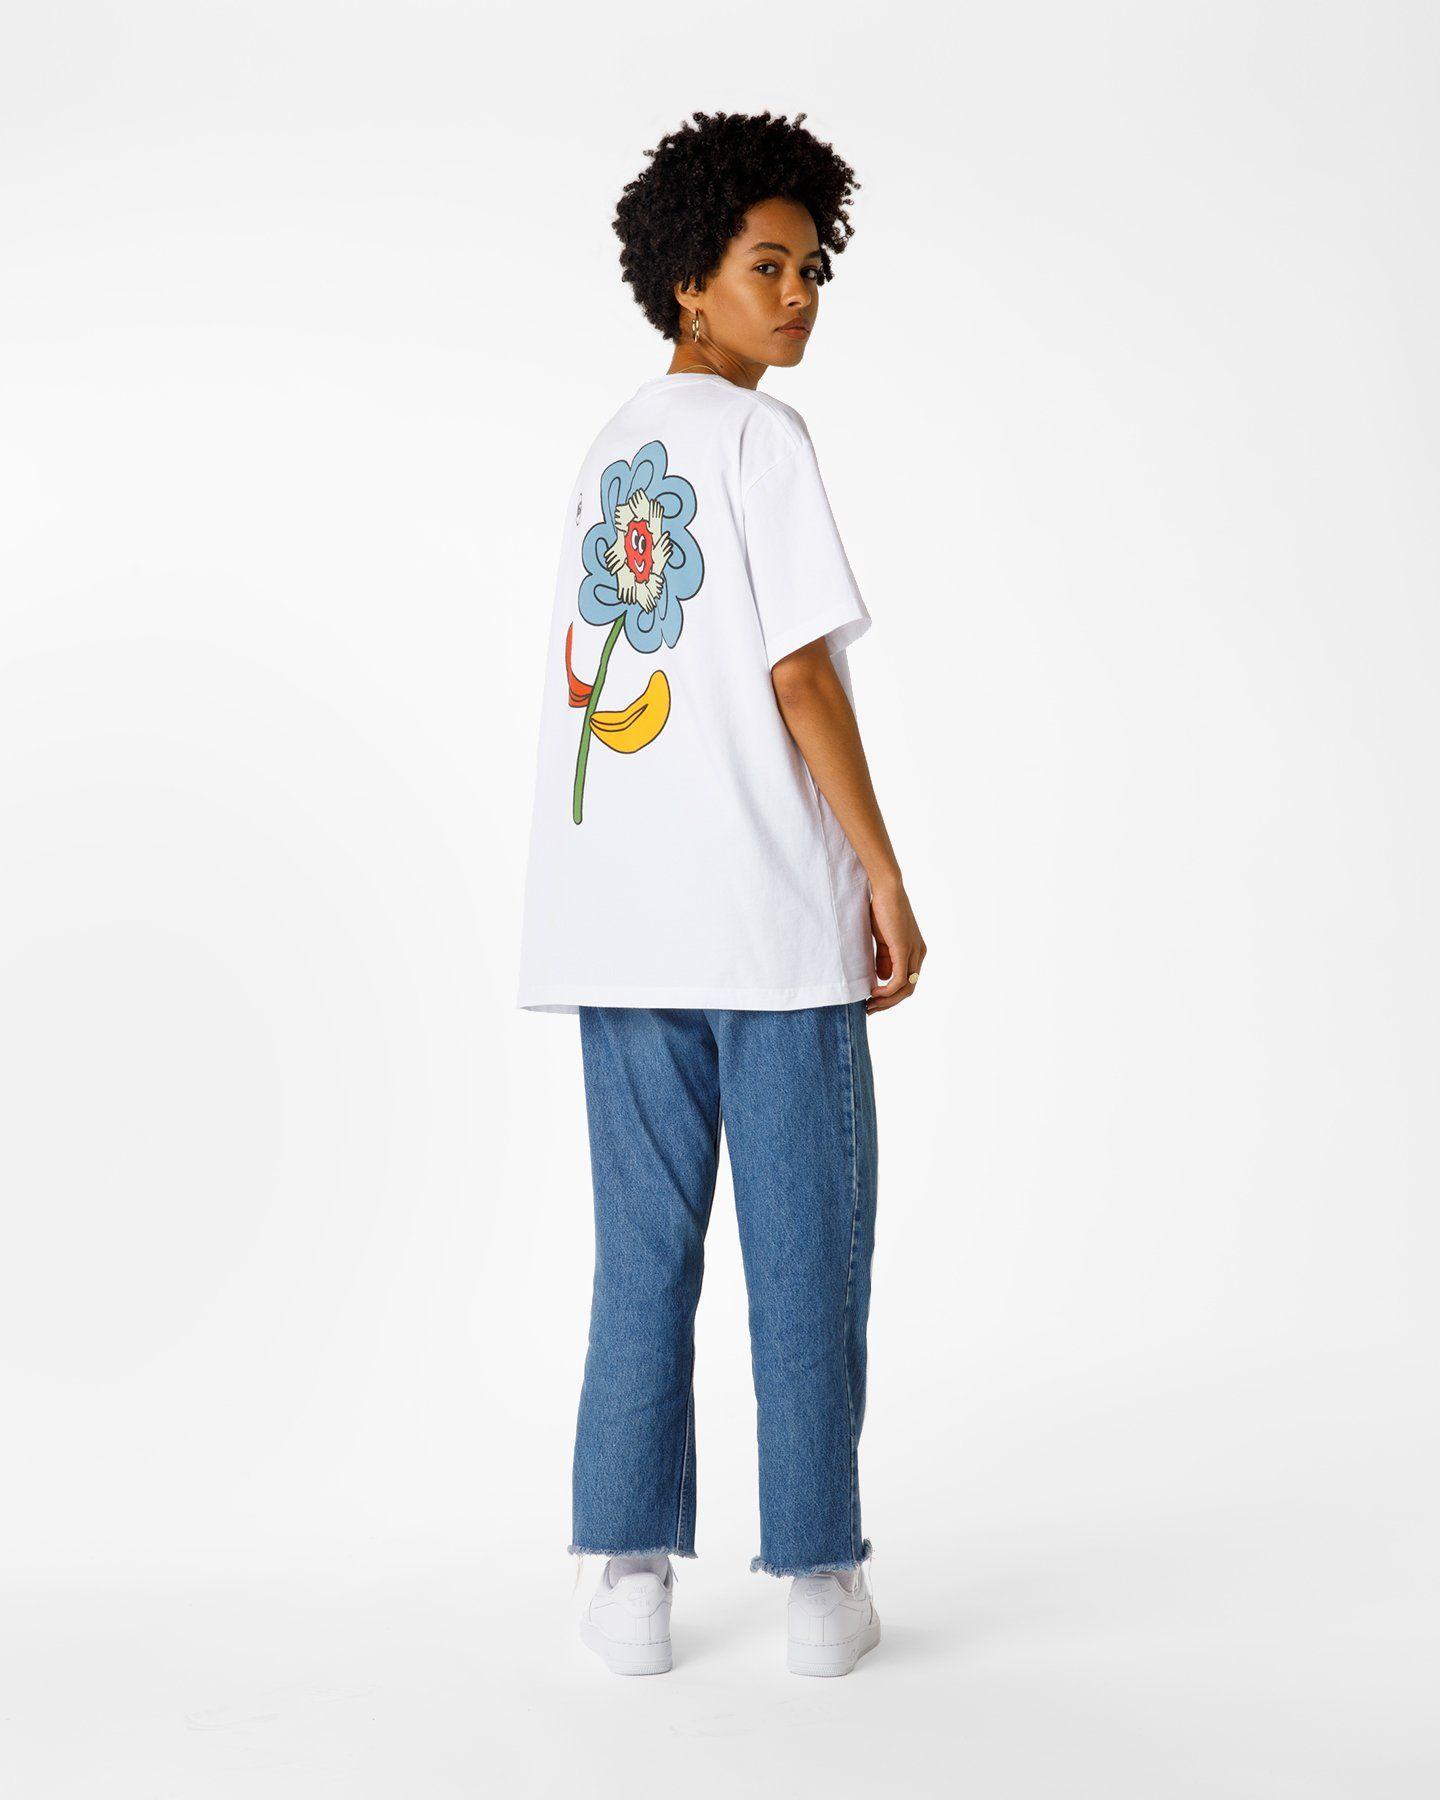 Highsnobiety in Good Company T-Shirt - Image 7